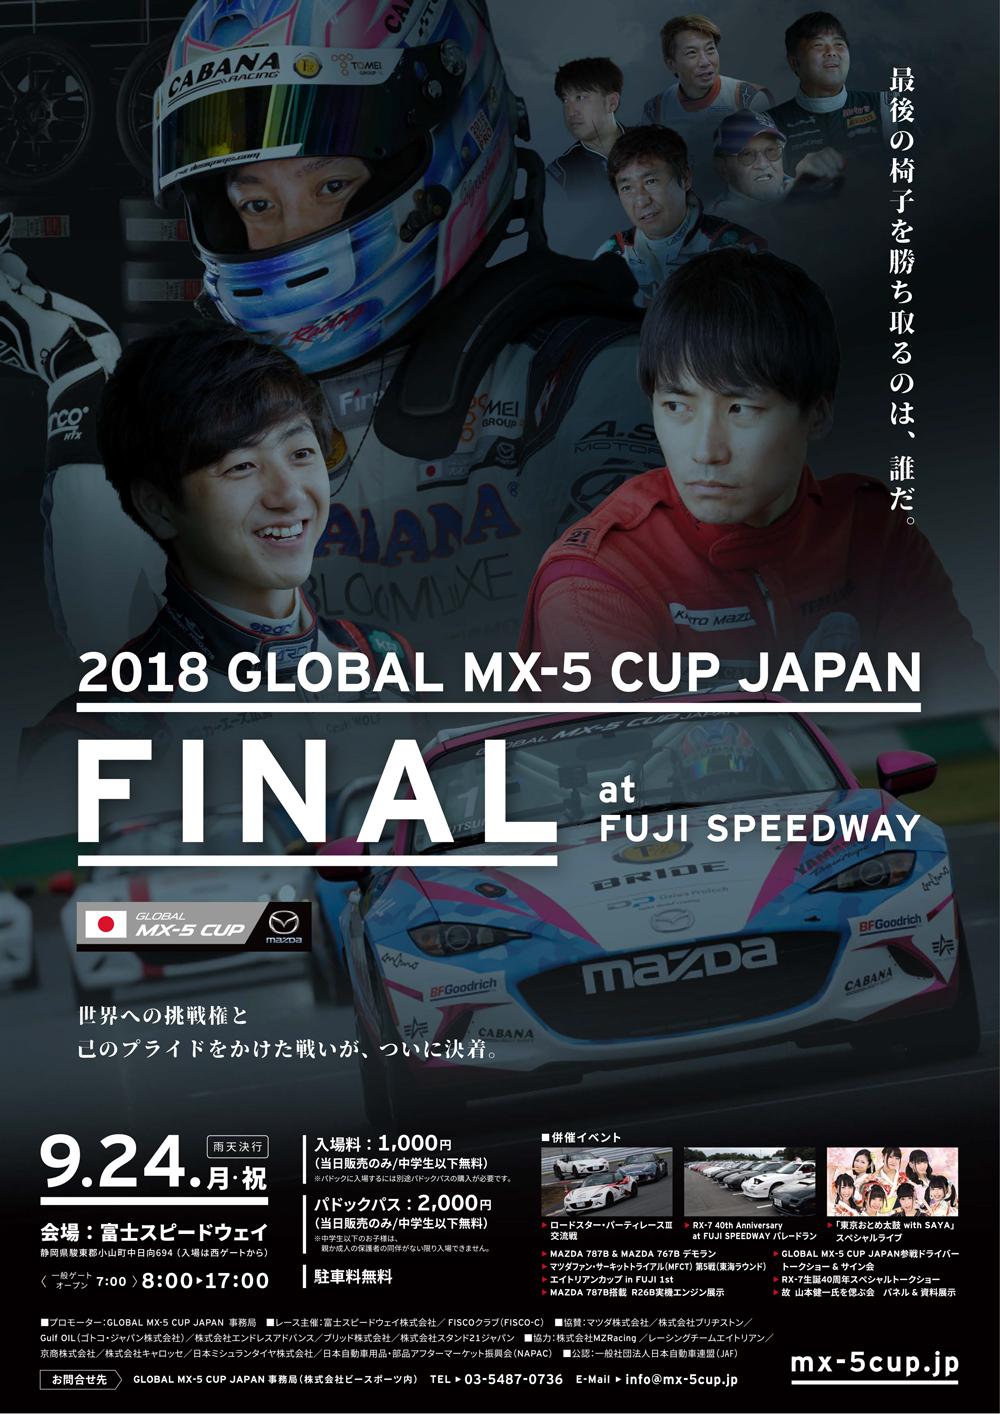 2018 GLOBAL MX-5 CUP JAPAN FINAL